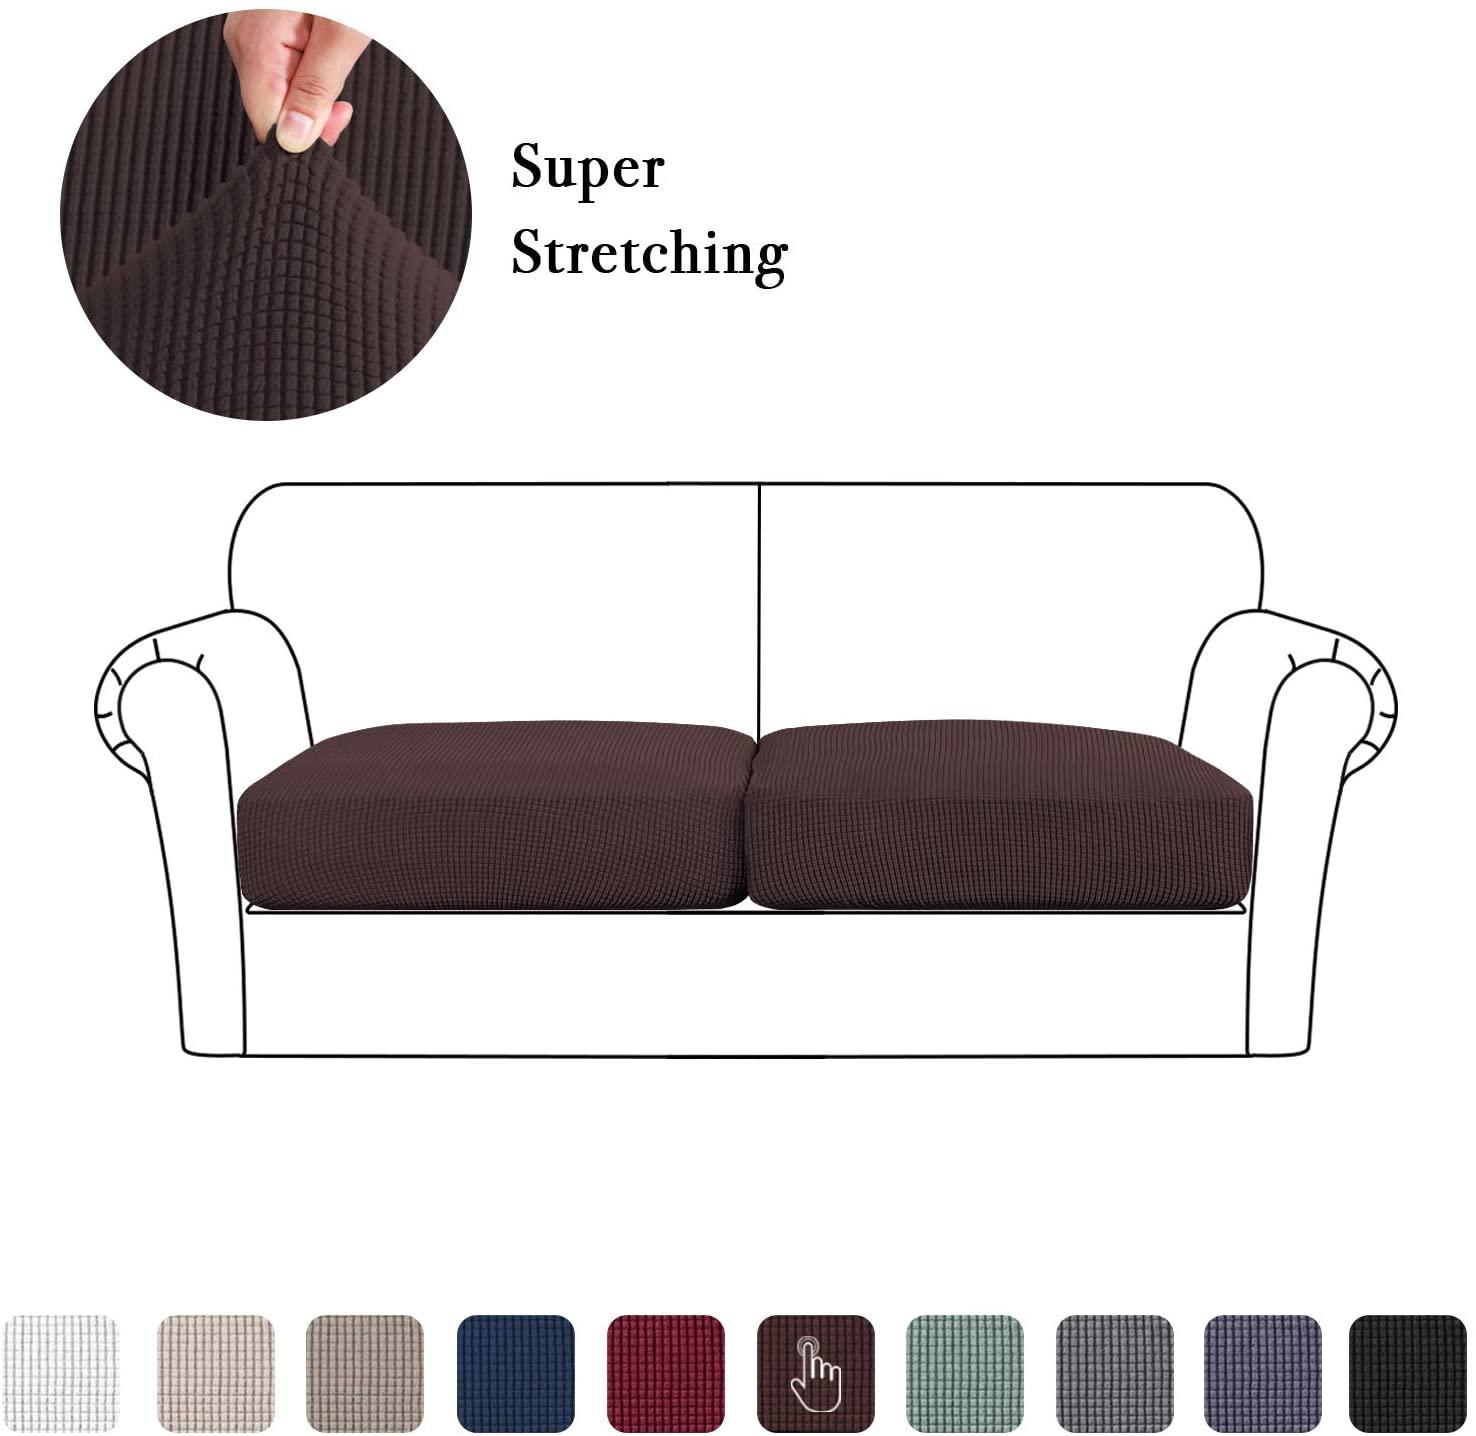 High Stretch Seat Cushion Cover Sofa Cushion Furniture Protector fot Sofa Seat Sofa Slipcover Sofa Cover Soft Flexibility with Elastic Bottom (2 Pieces Cushion Covers, Brown)